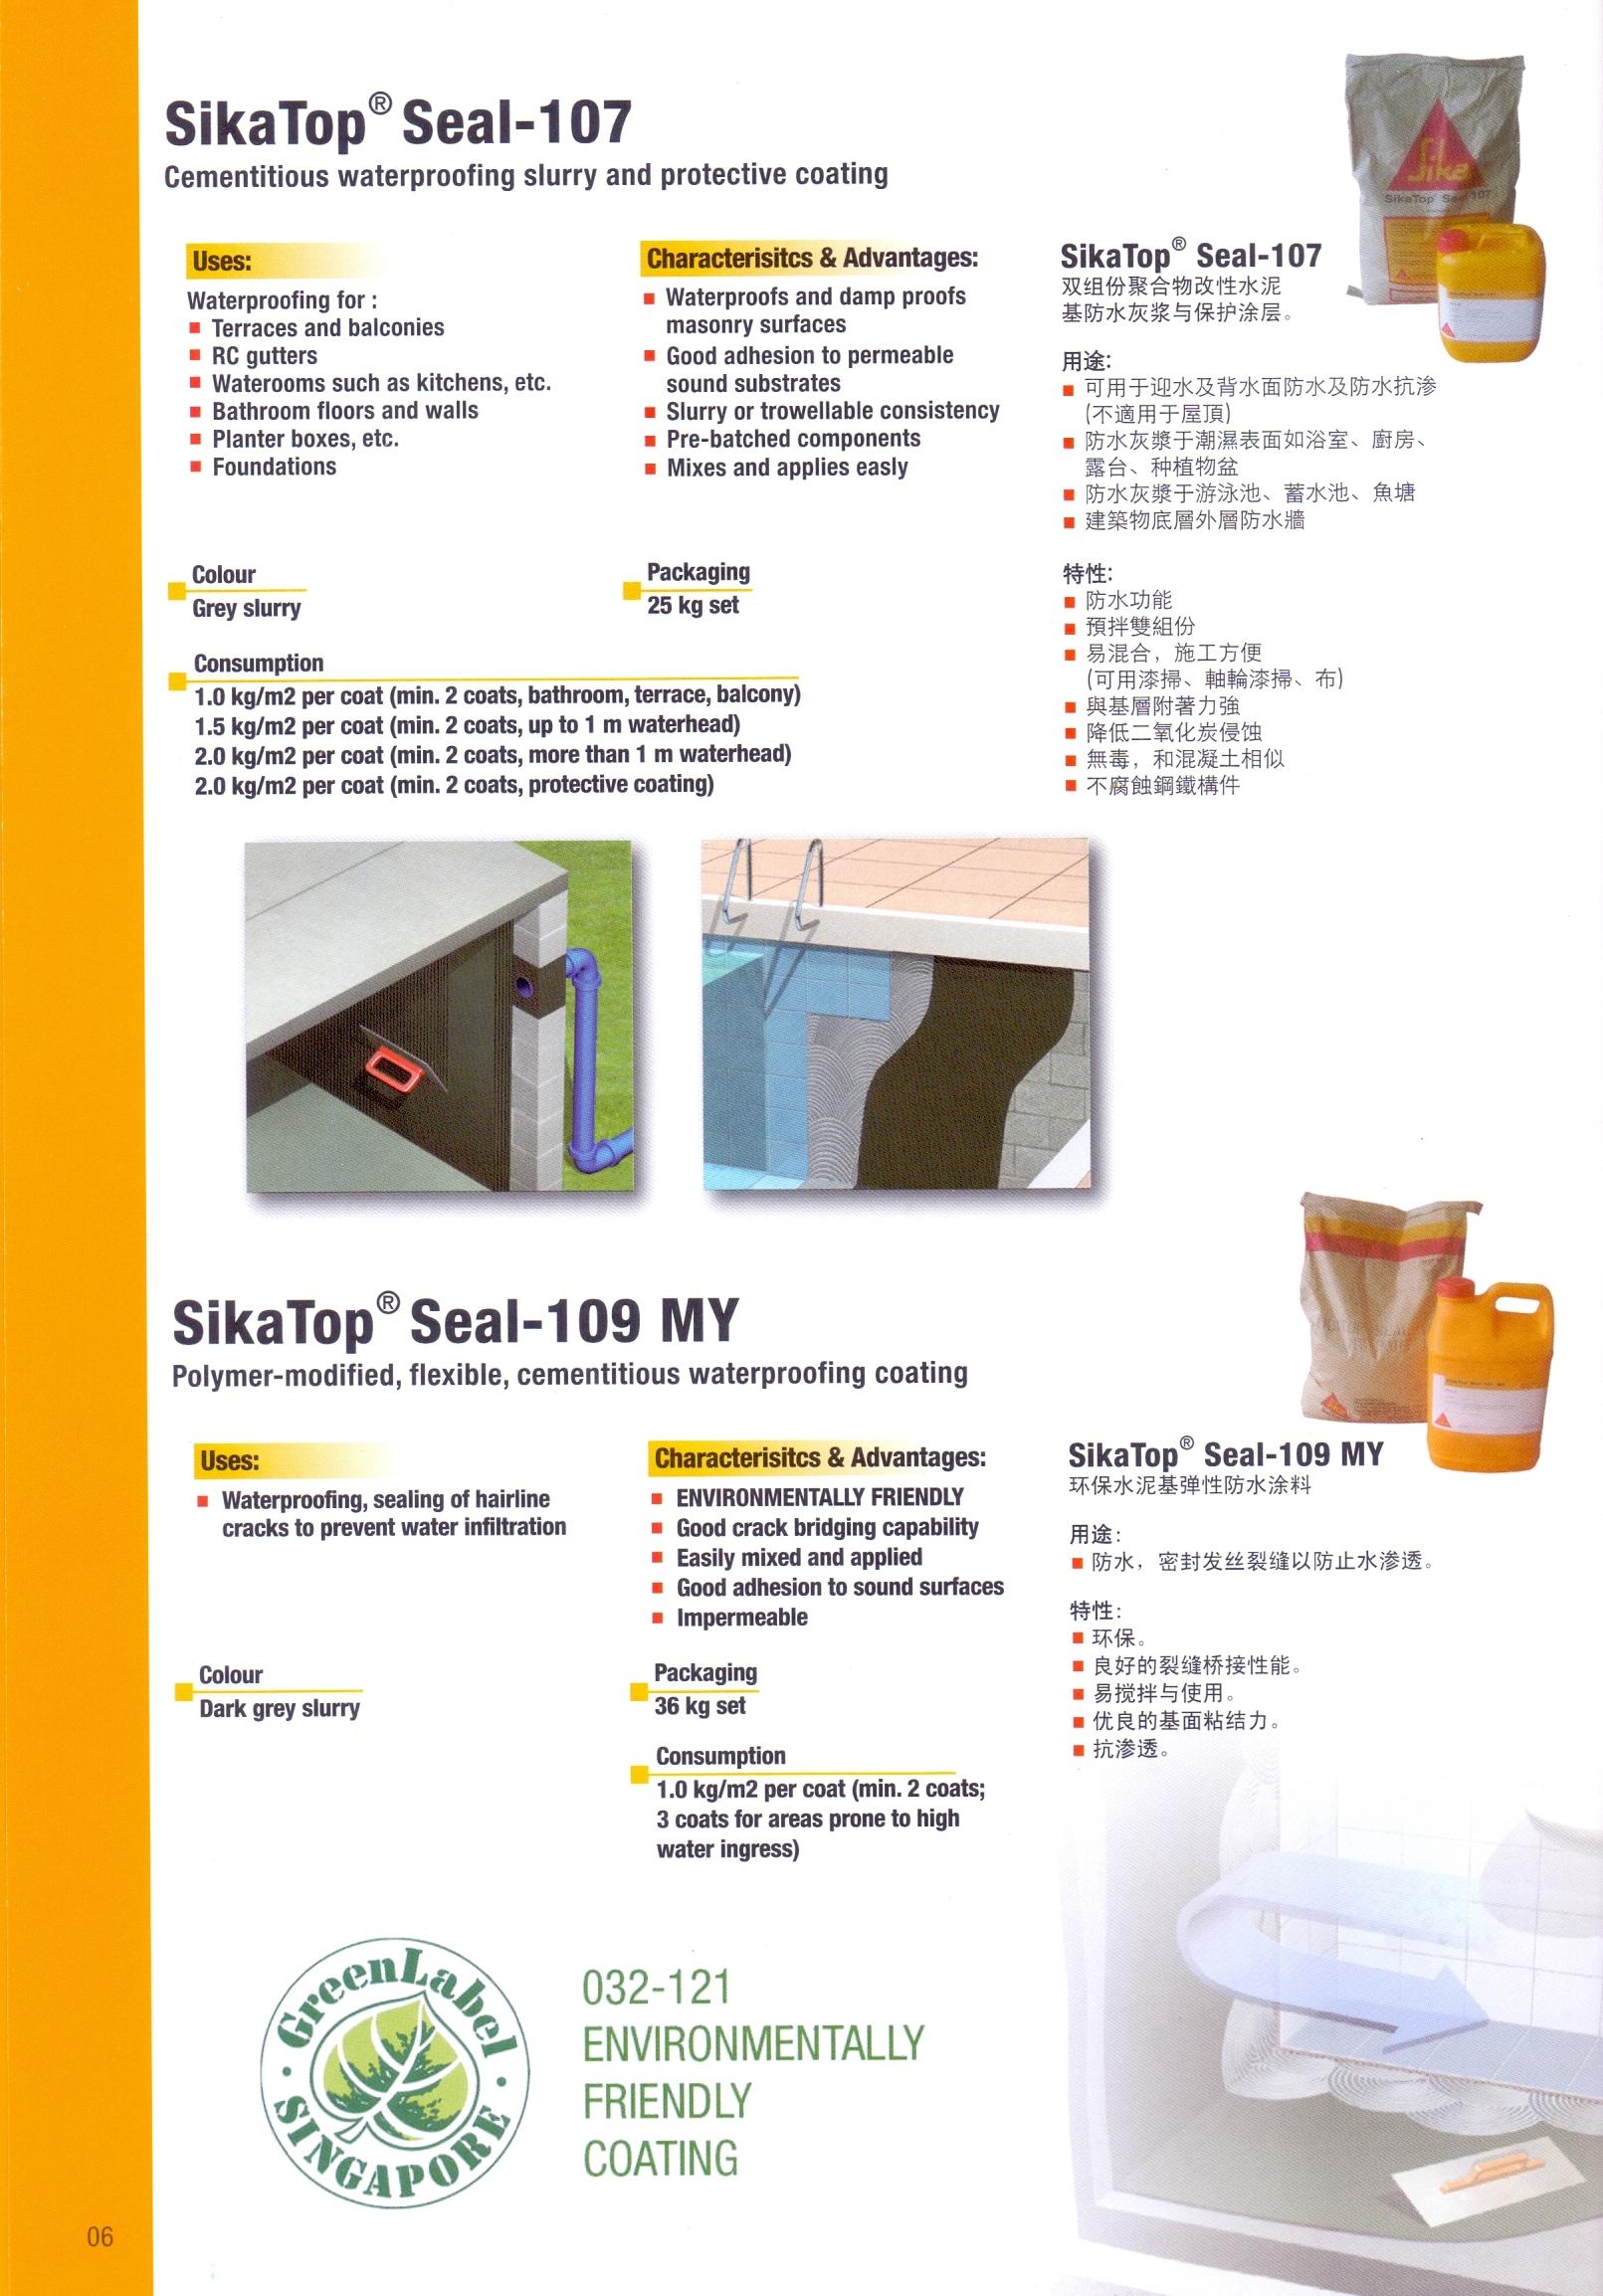 SikaTop Seal - 107  SikaTop Seal - 109 MY